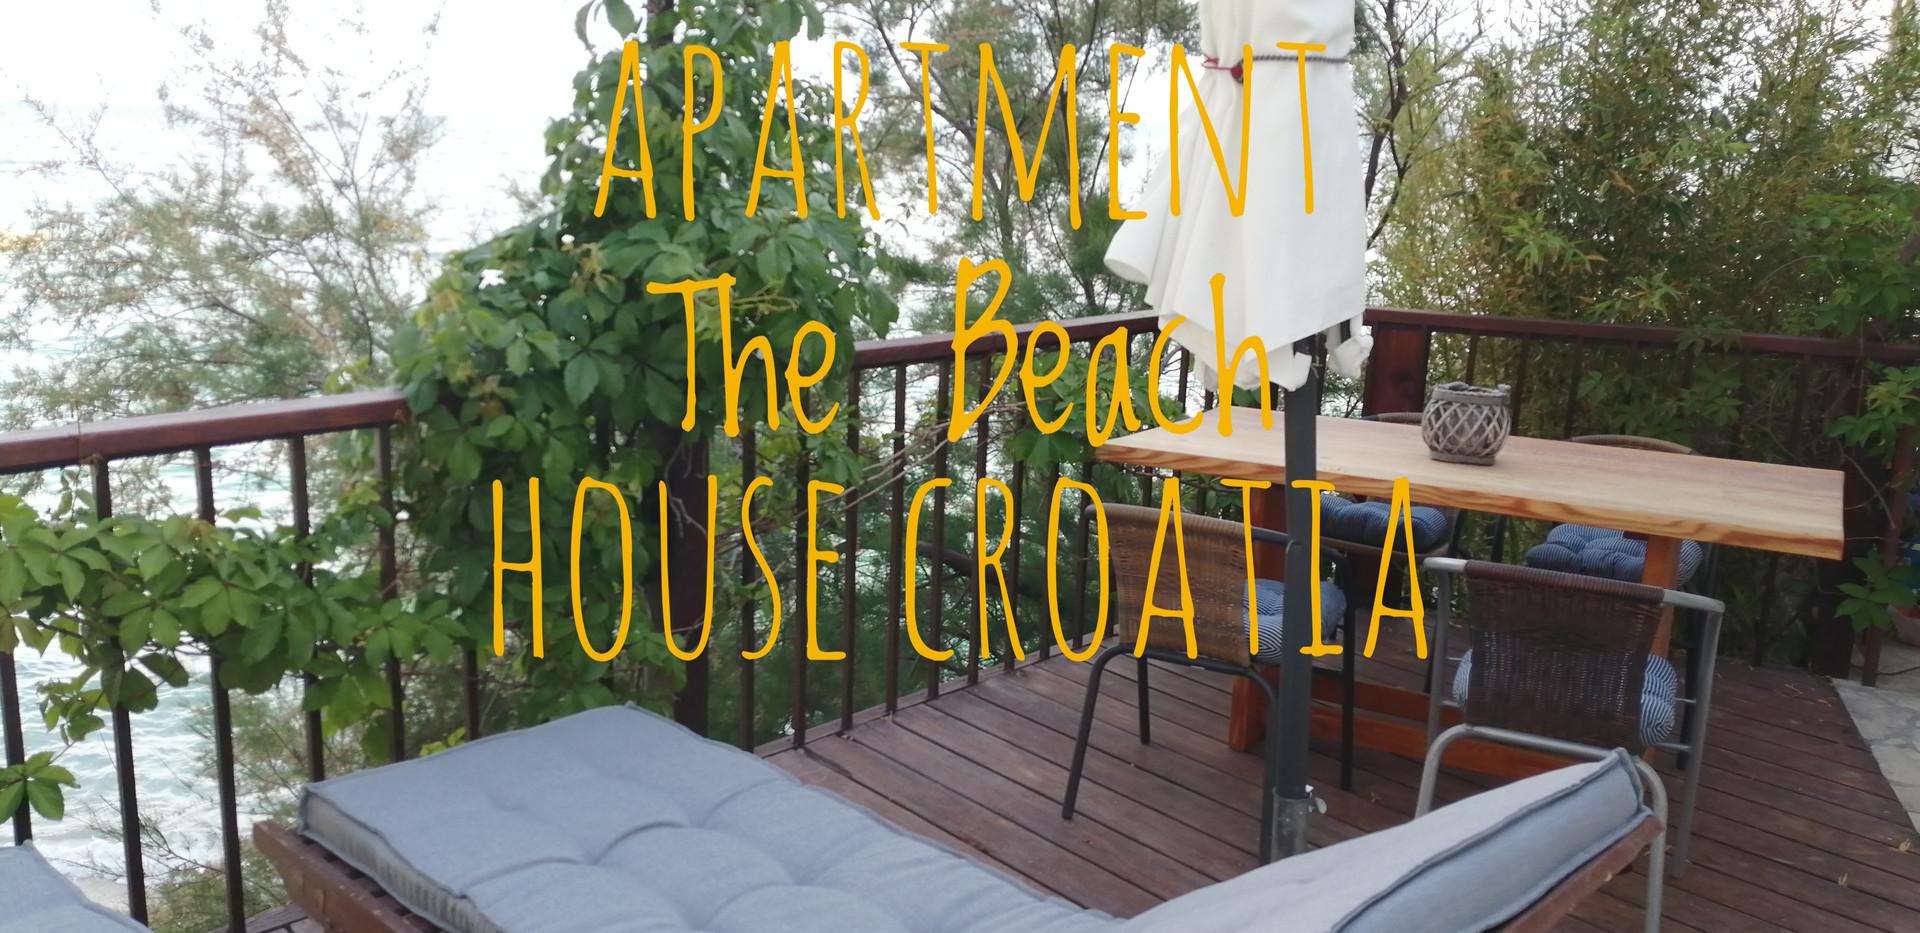 The Beach house Croatia